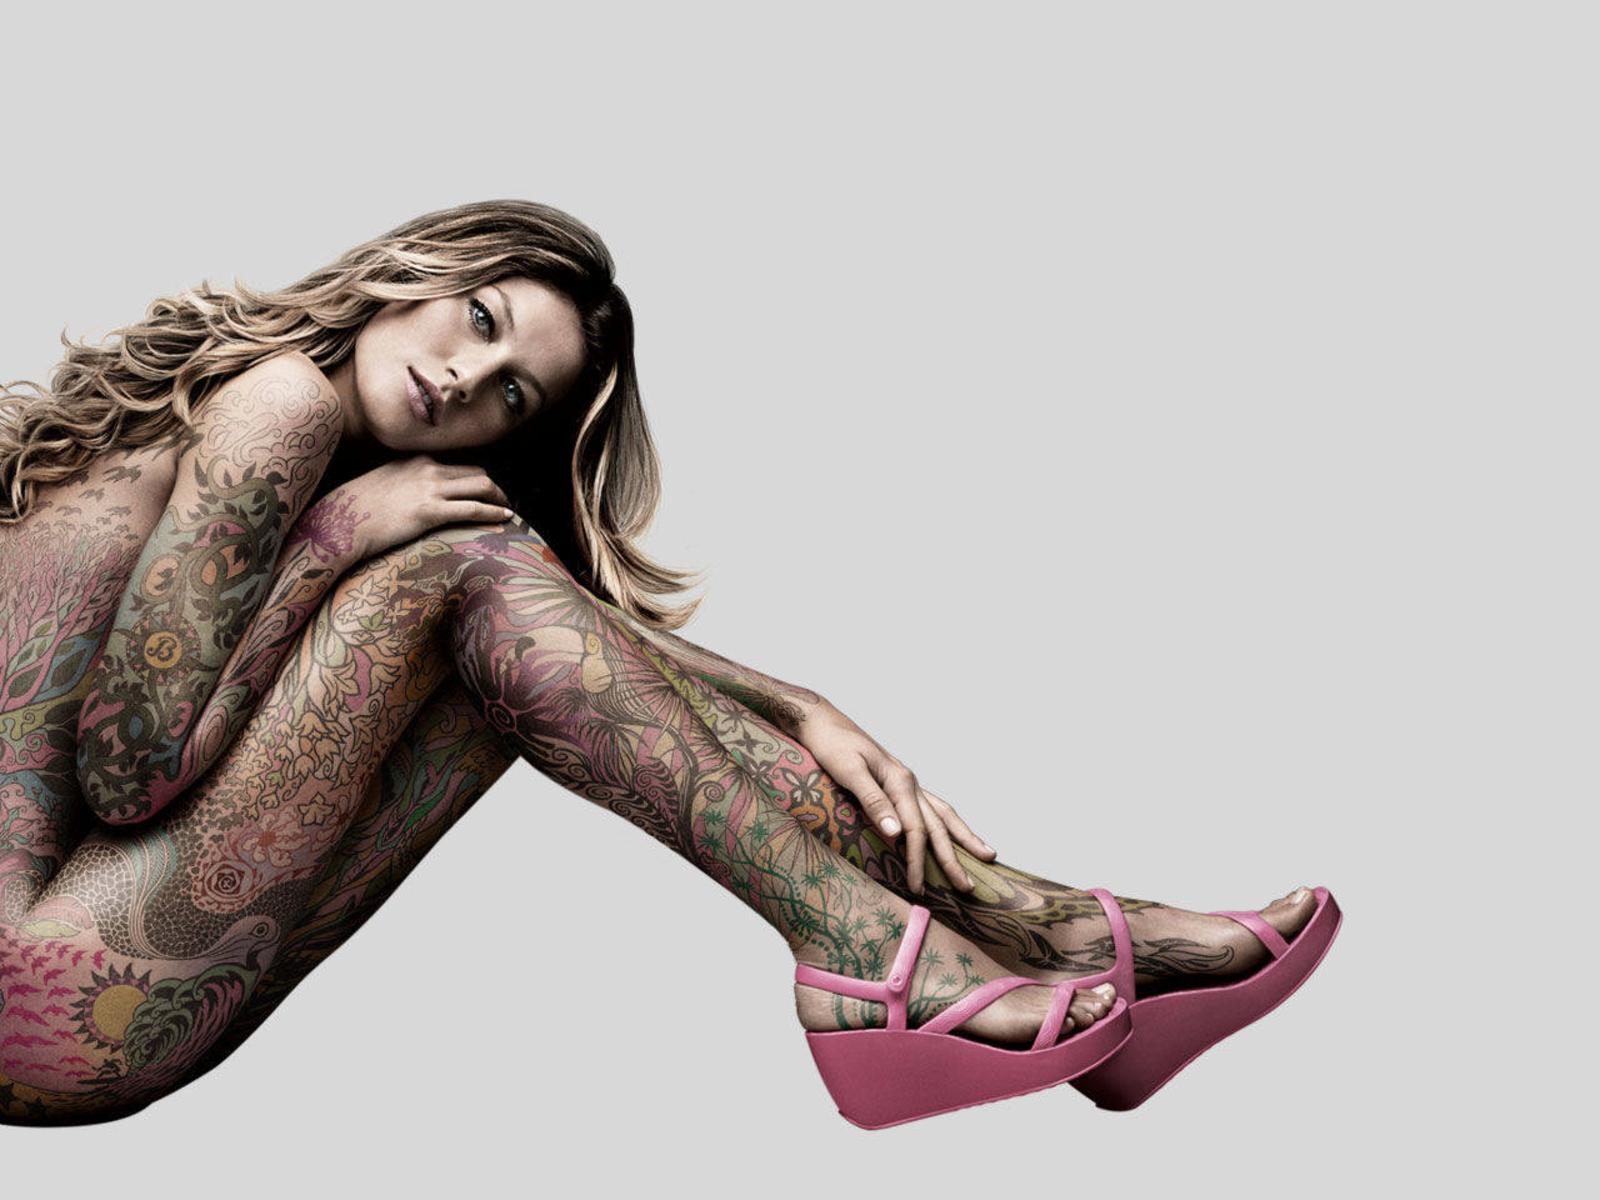 The Toe Cleavage Blog: Nude! - Gisele Bündchen (pt 1)